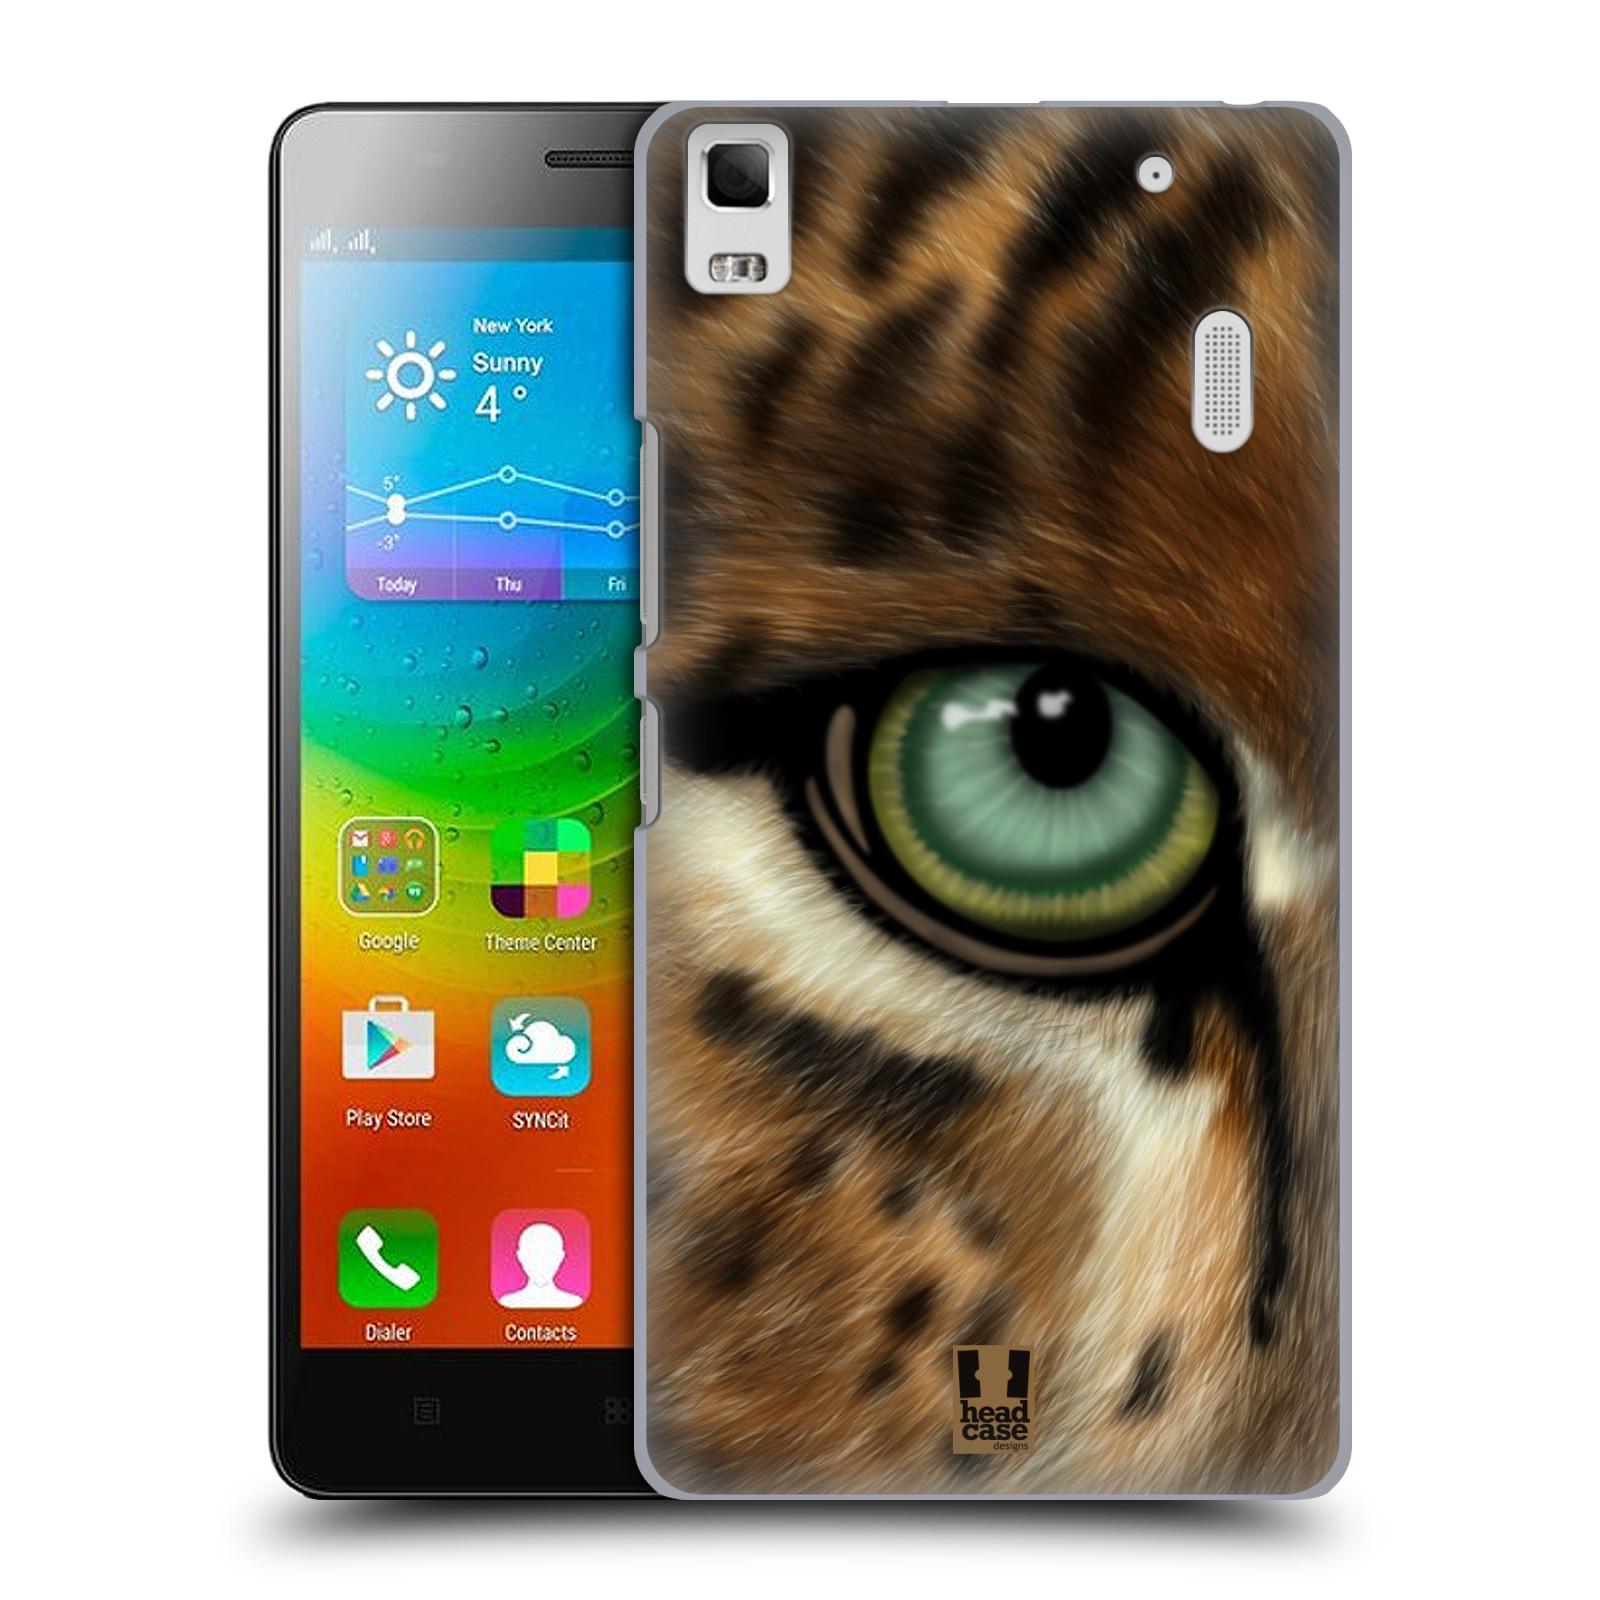 HEAD CASE pevný plastový obal na mobil LENOVO A7000 / A7000 DUAL / K3 NOTE vzor pohled zvířete oko leopard